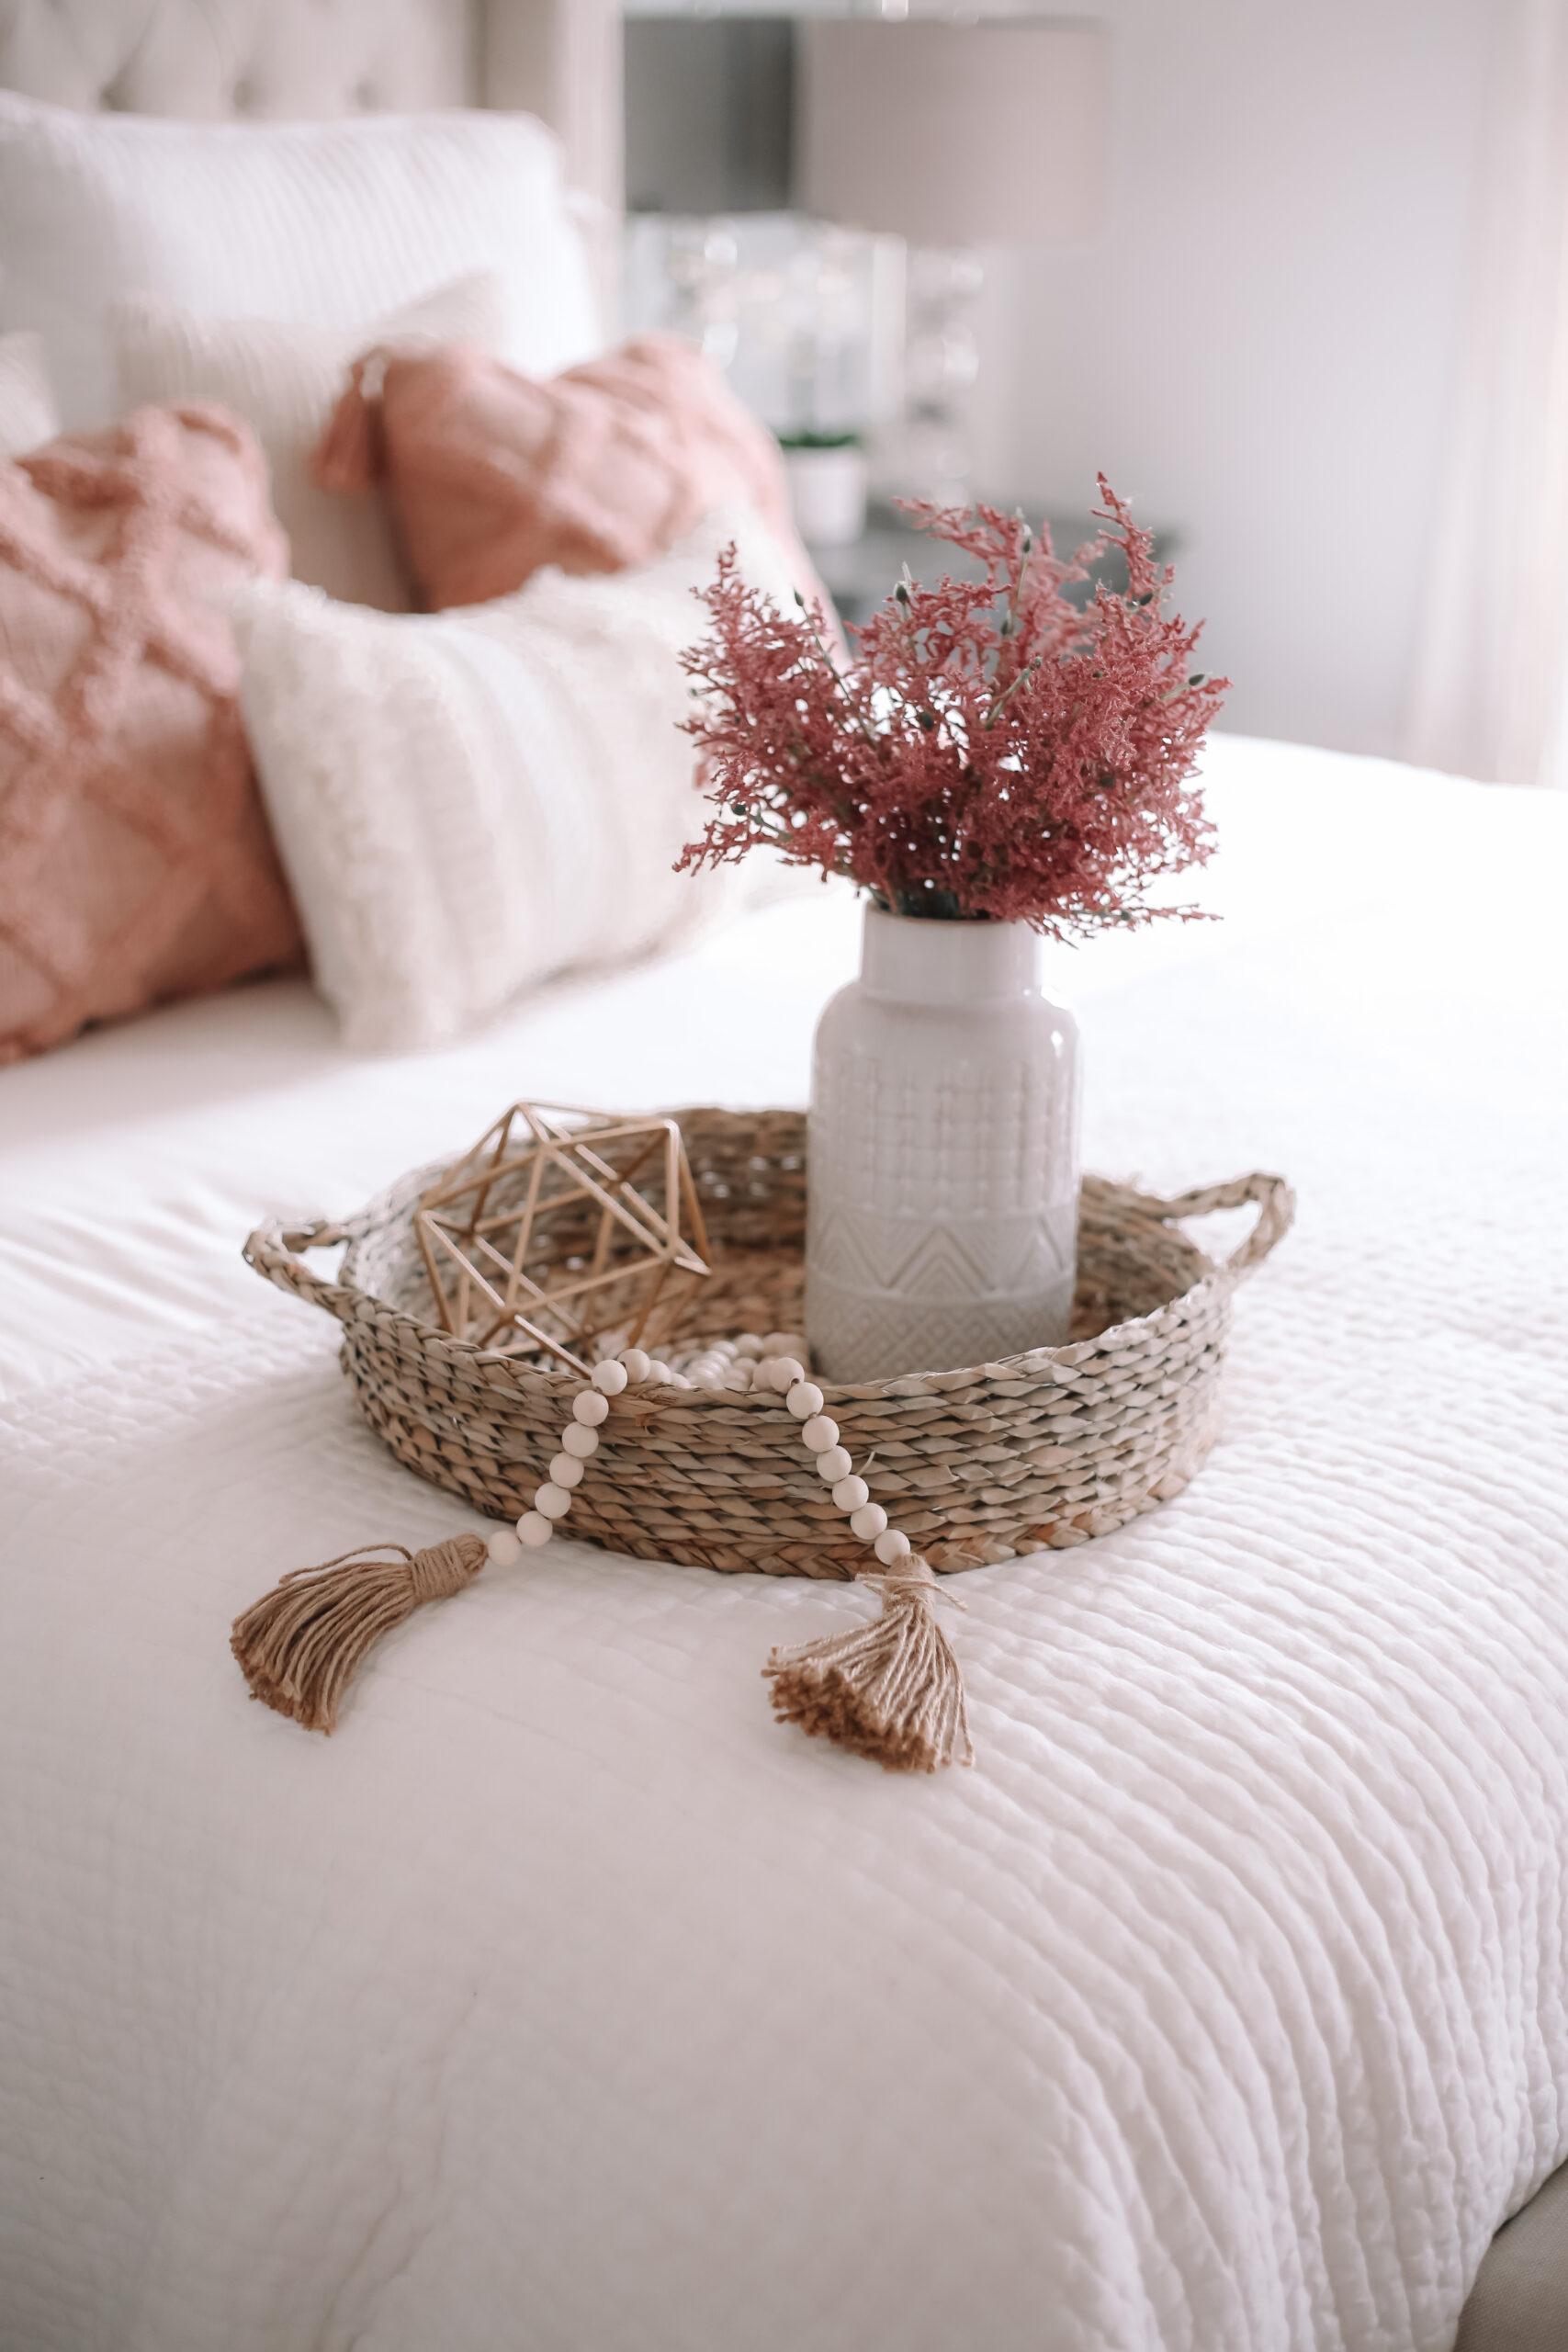 walmart home decor, walmart master bedroom